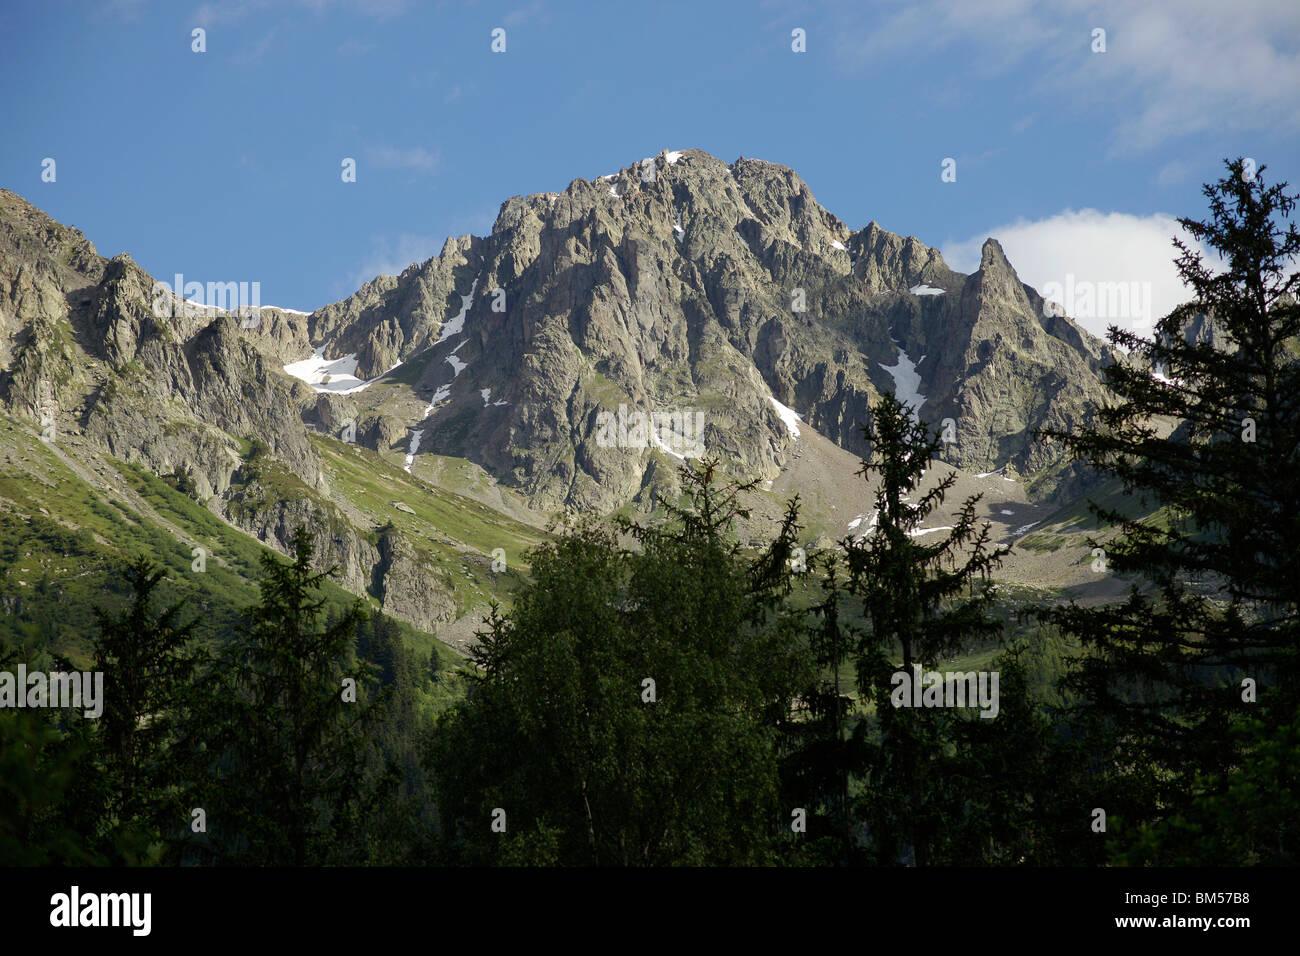 Mont Blanc Massif, near Chamonix-Mont-Blanc, France, Europe Stock Photo